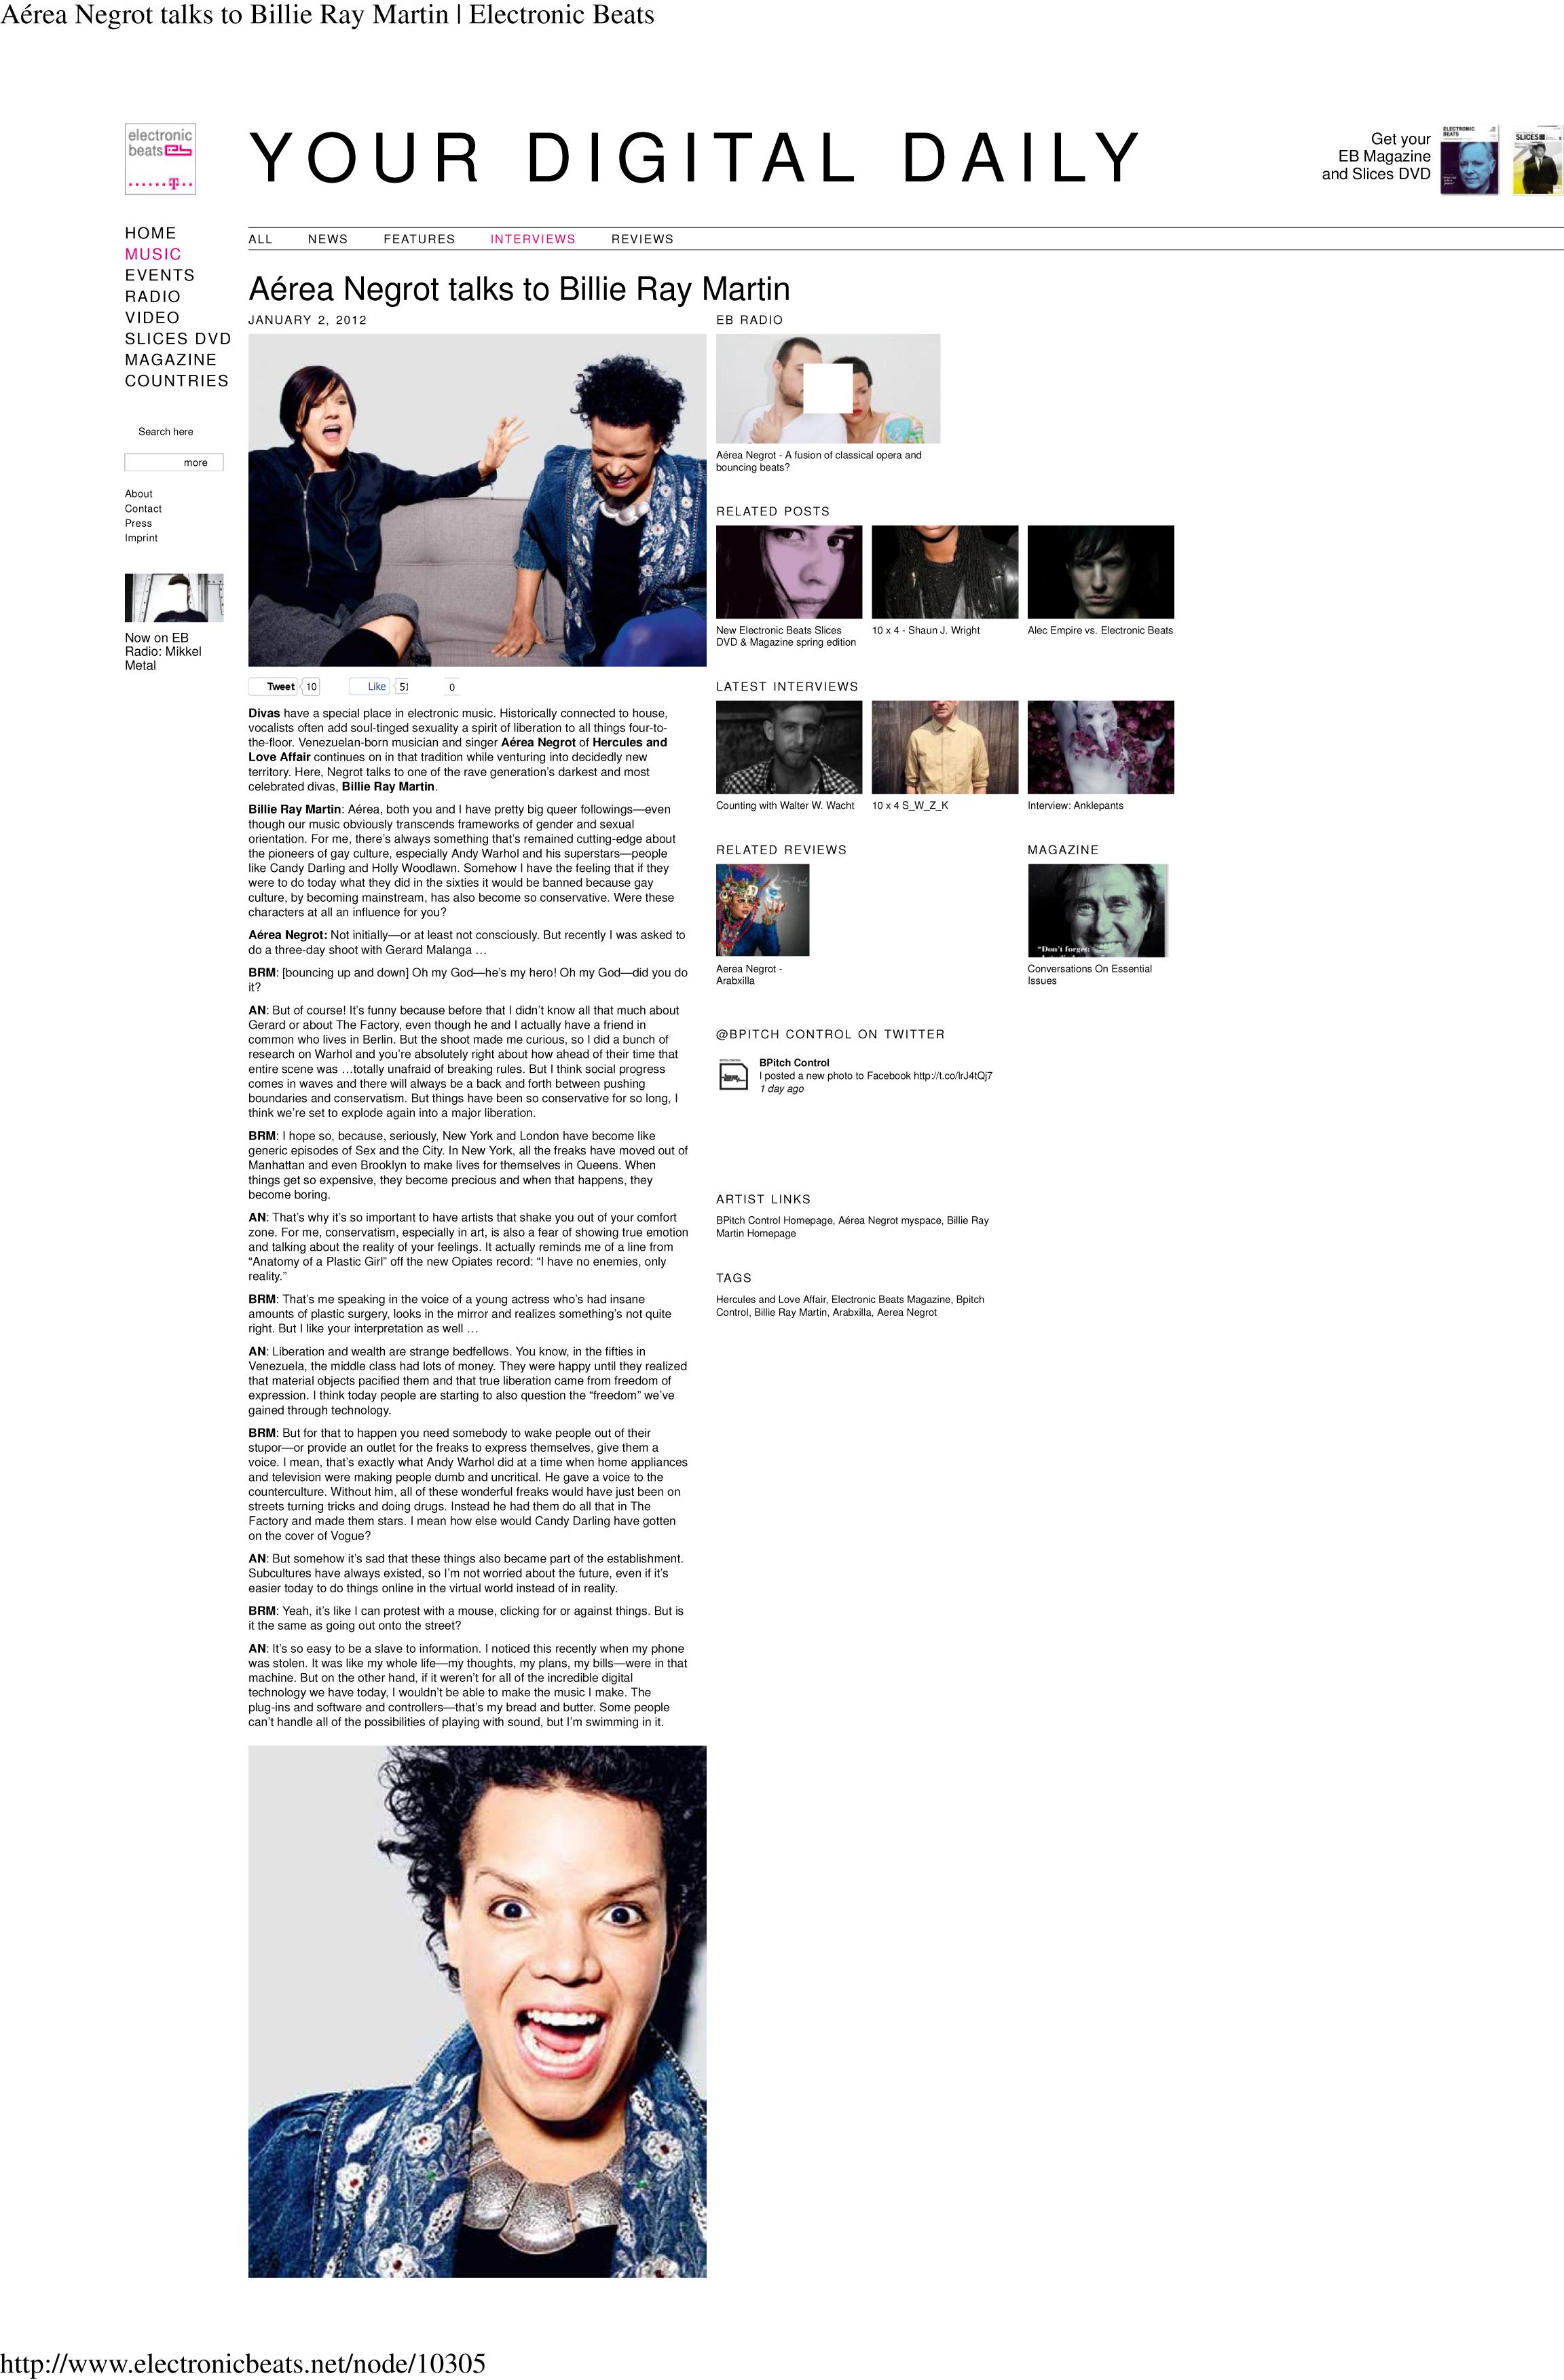 (A351rea Negrot talks to Billie Ray Martin | Electronic Beats)